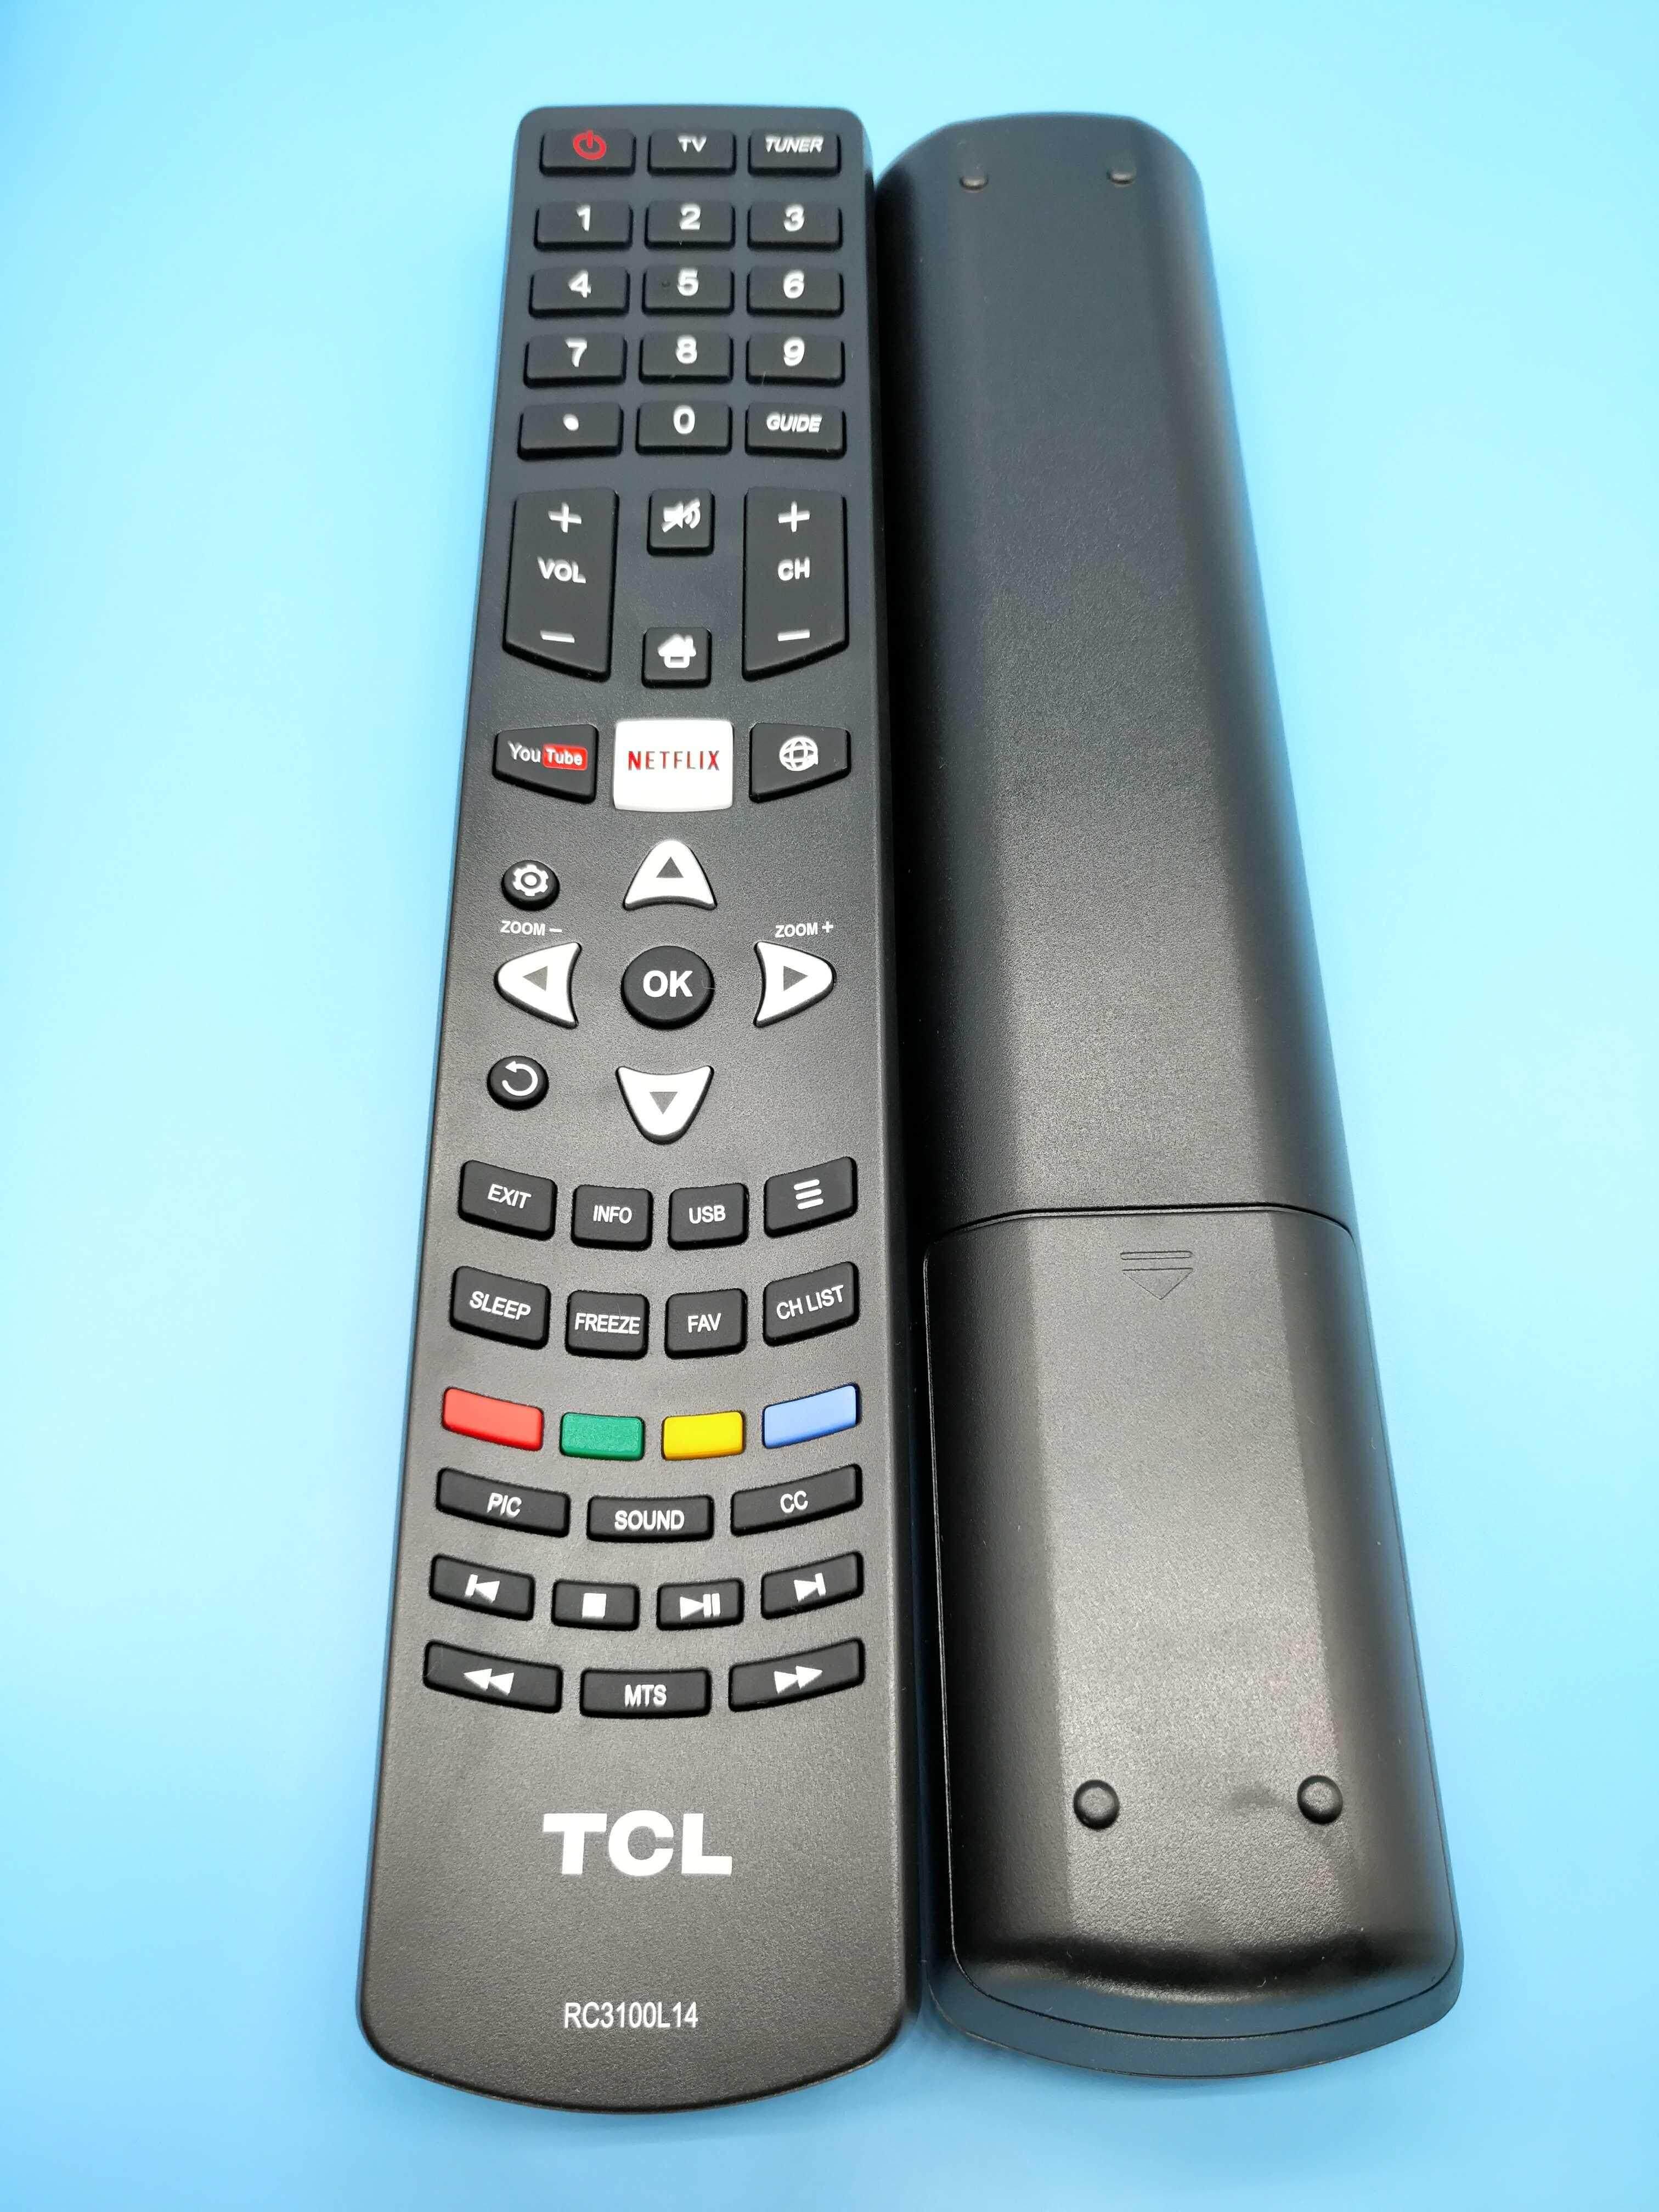 TCL RC3100L14 Remote Control Origional Product TCL RC3100L14 TV Remote Control